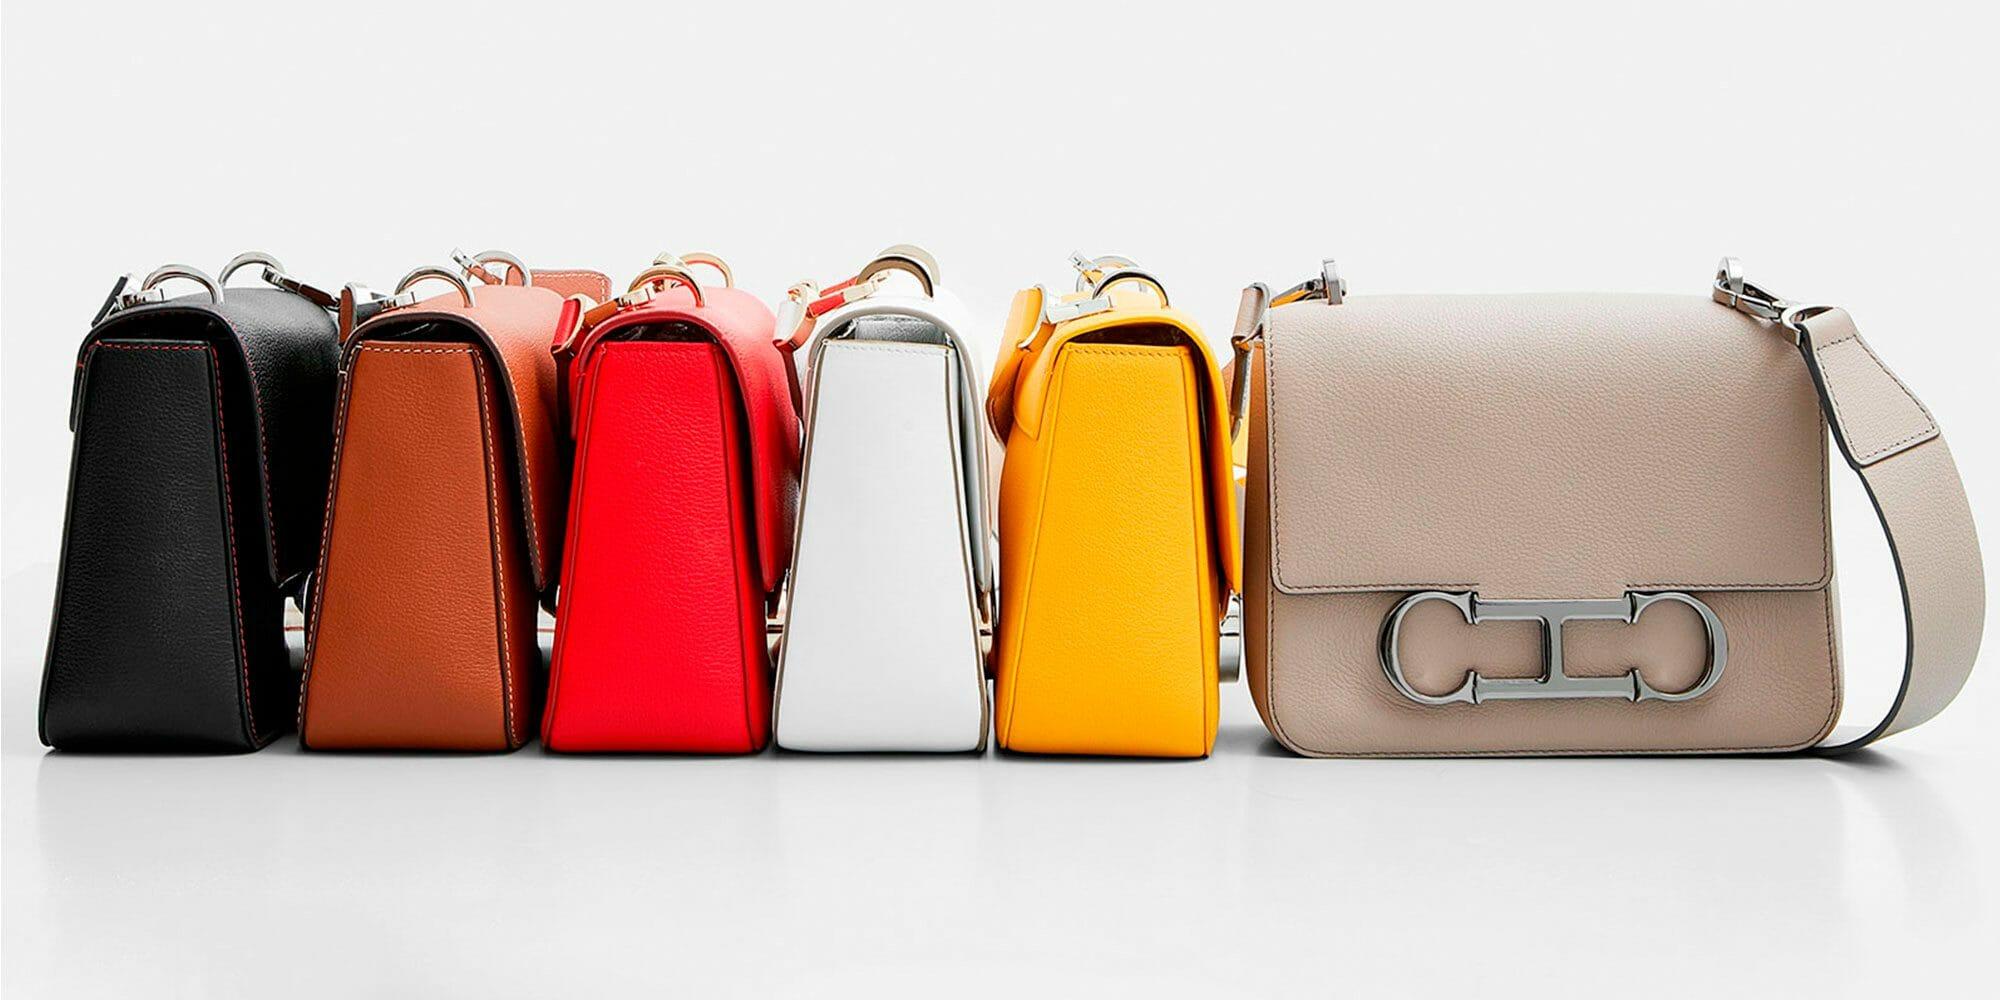 ch-carolina-herrera-insignia-bags-multiple-colors-group-image